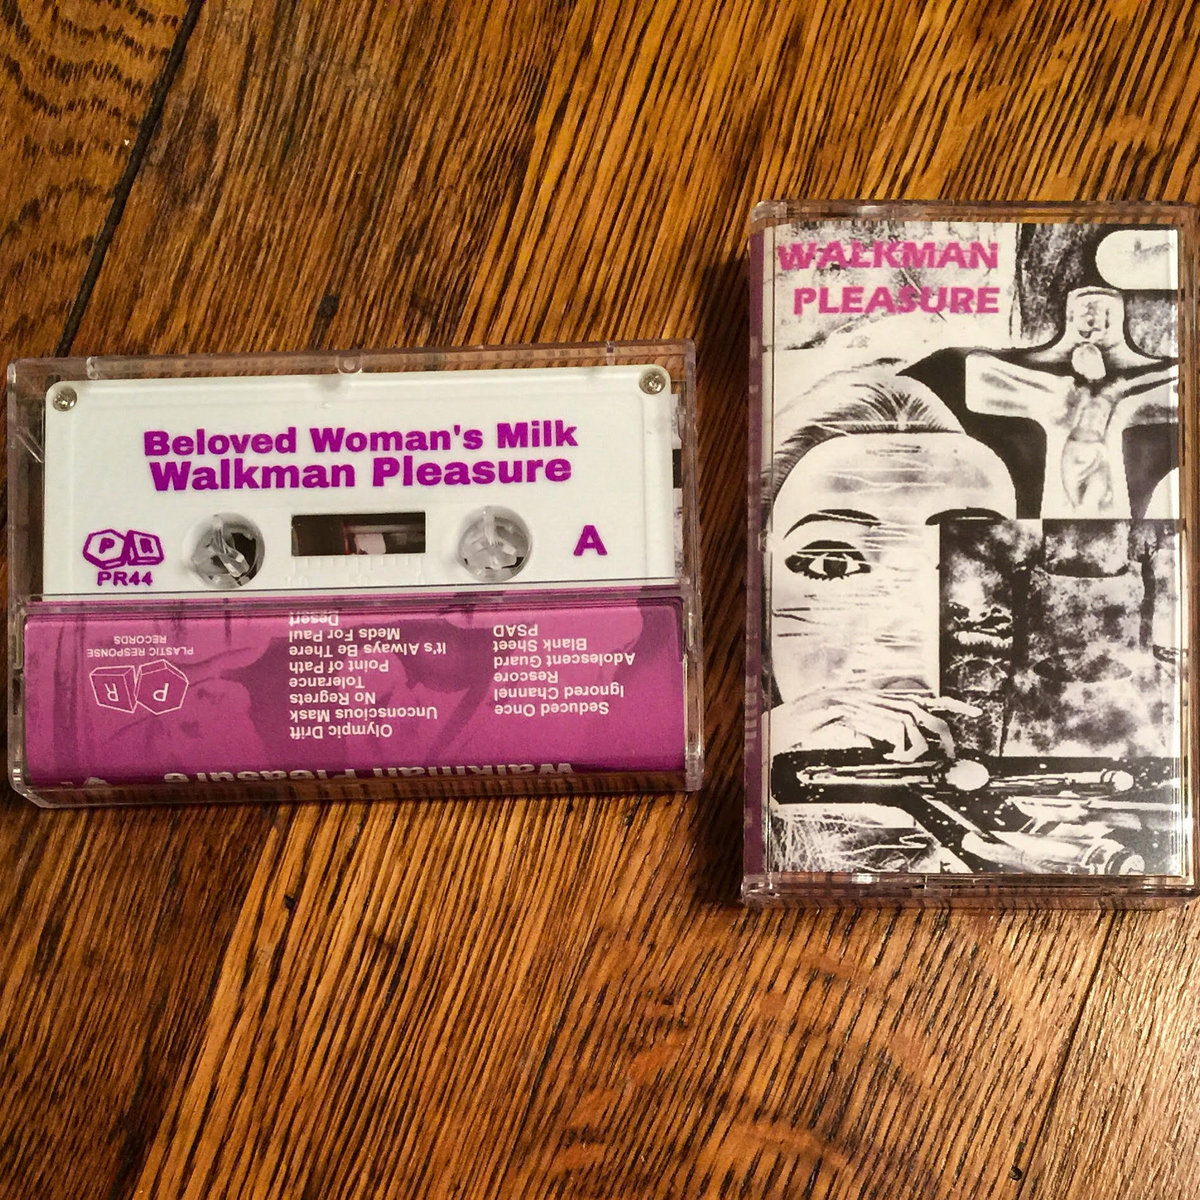 Walkman Pleasure | plastic response records